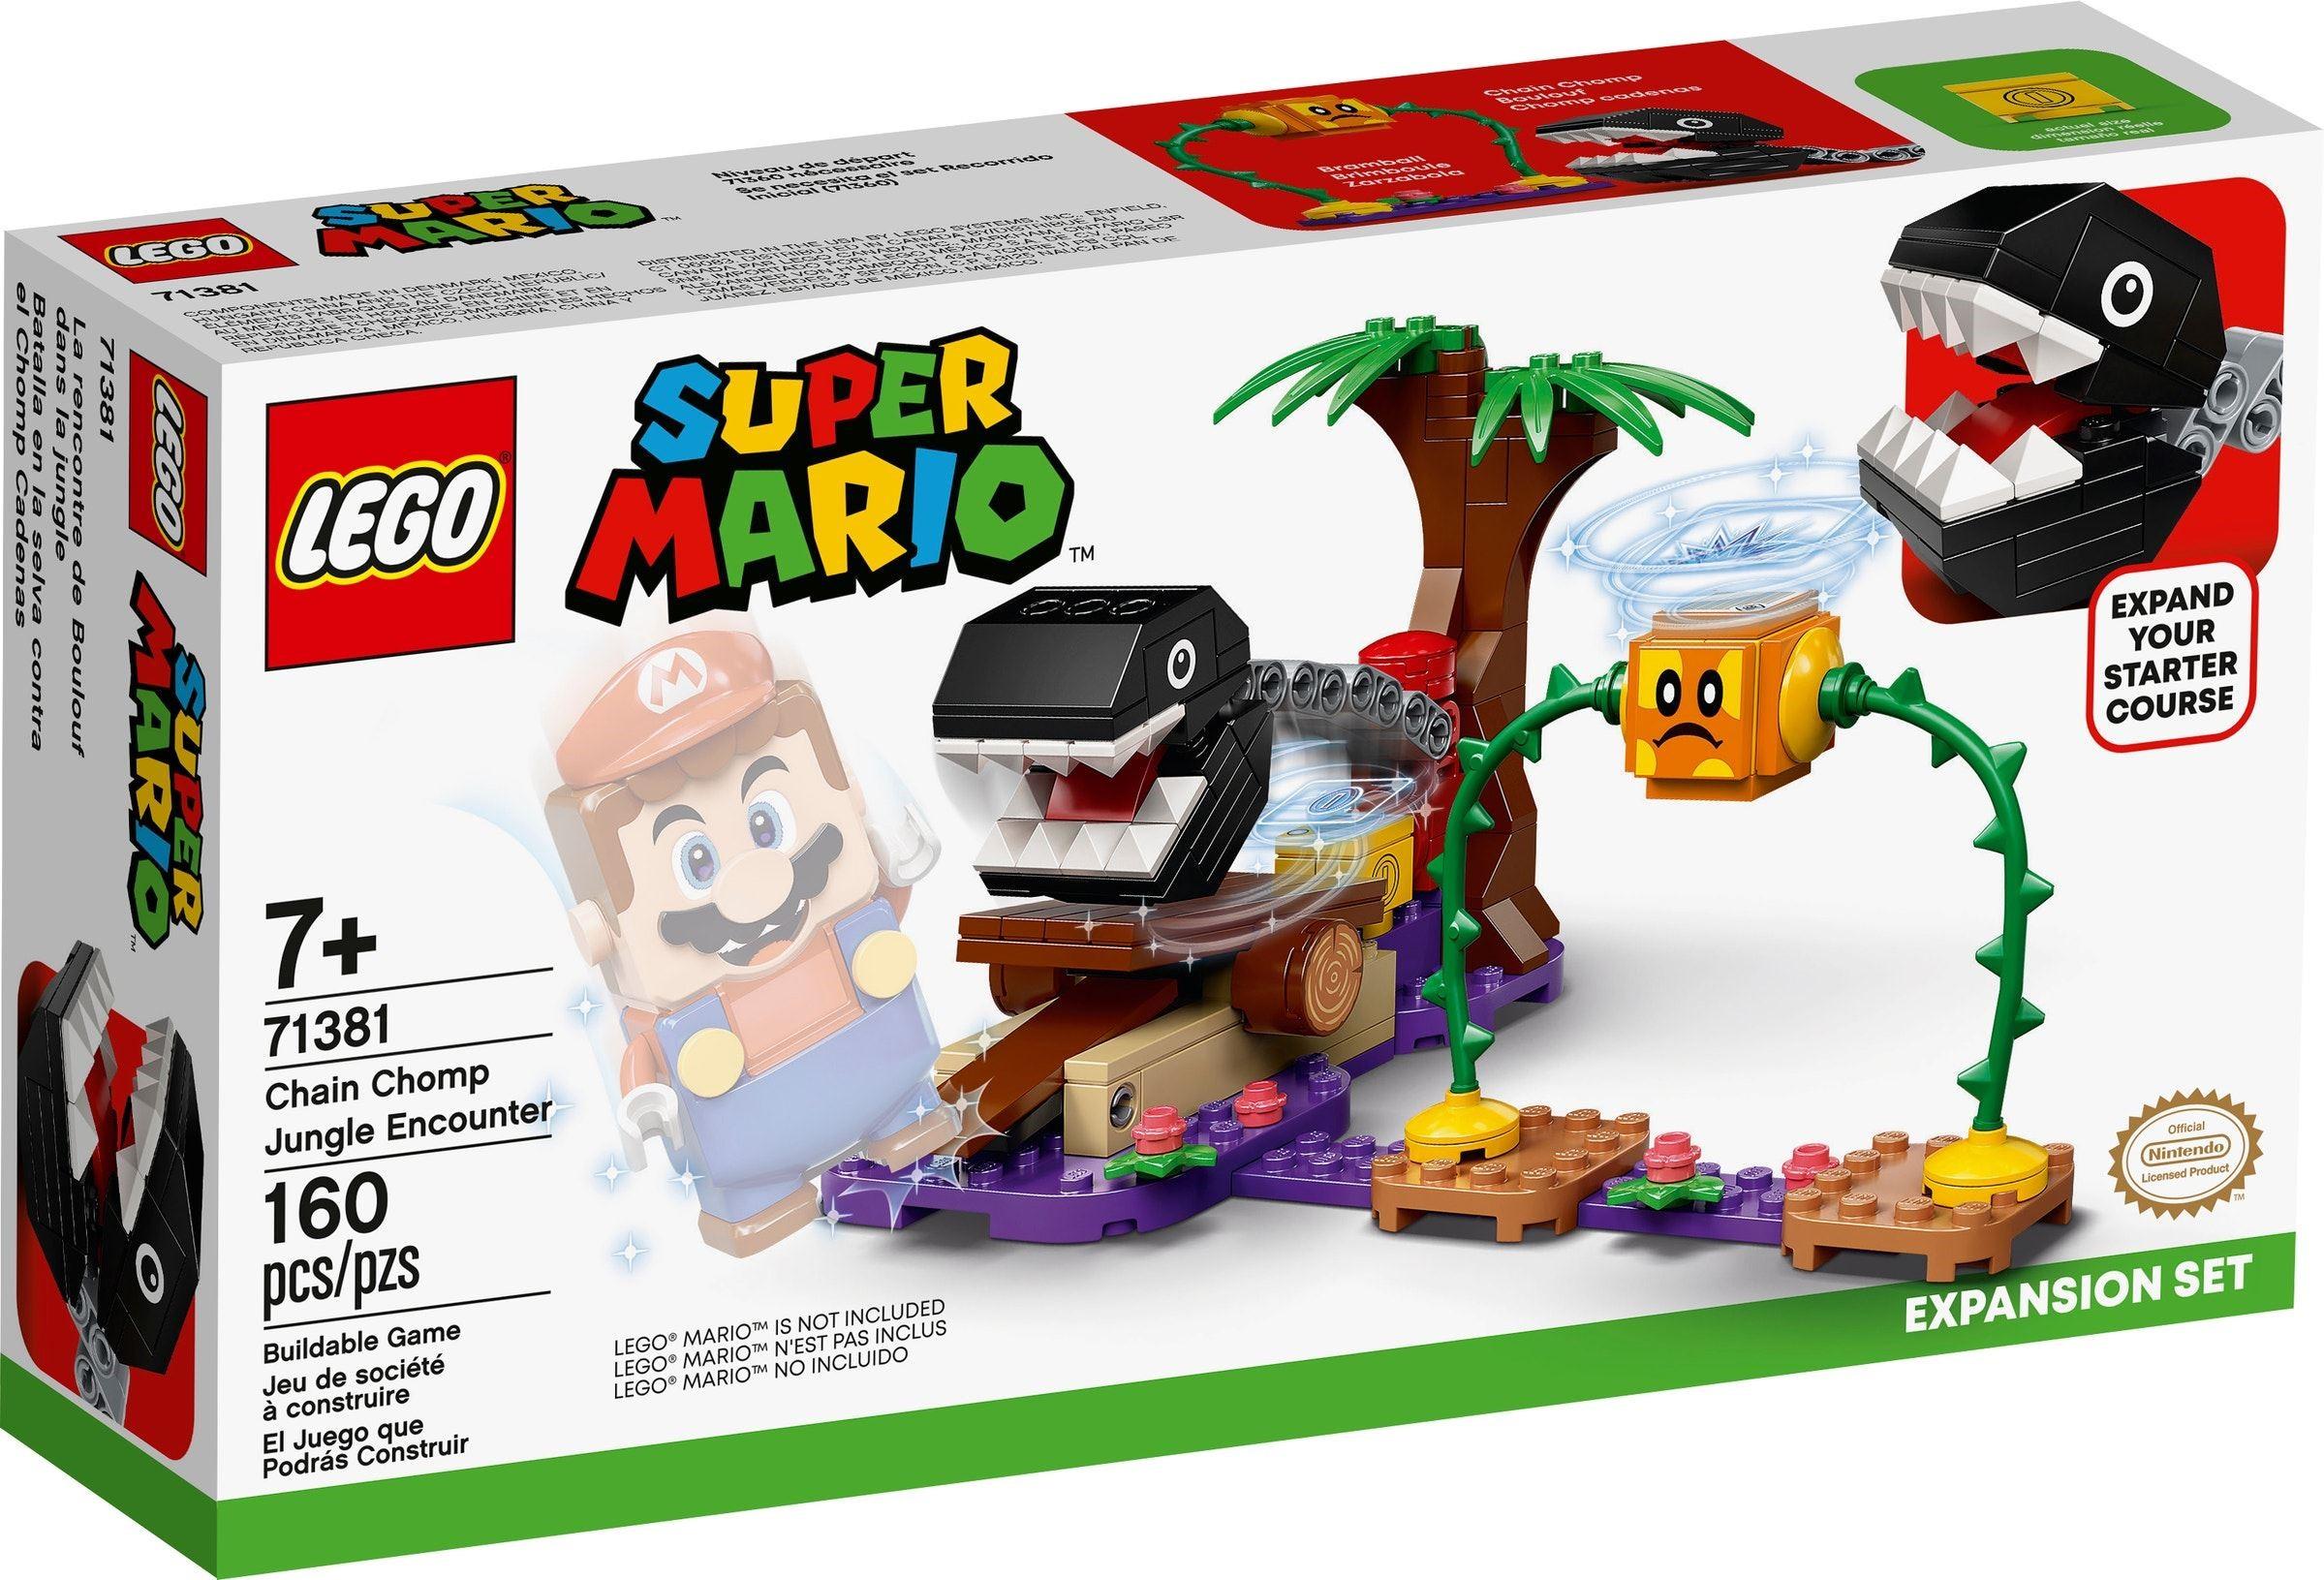 LEGO Super Mario - Chain Chomp Jungle Encounter Expansion Set (71381)